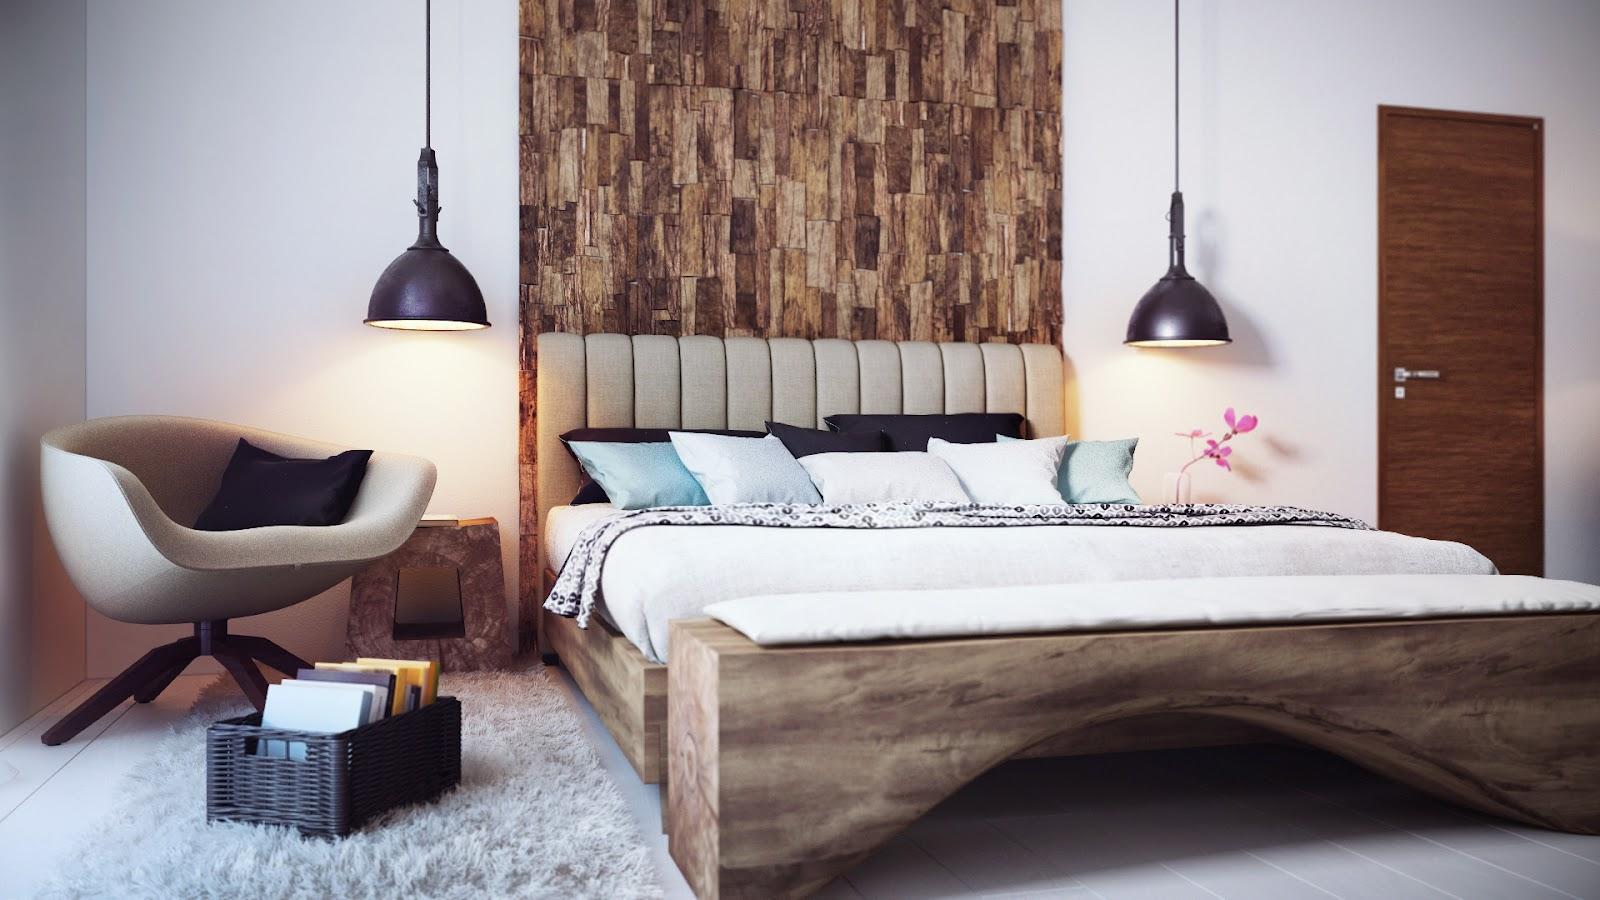 Cozy minimalist bedroom by Alexander Uglyanitsa 1